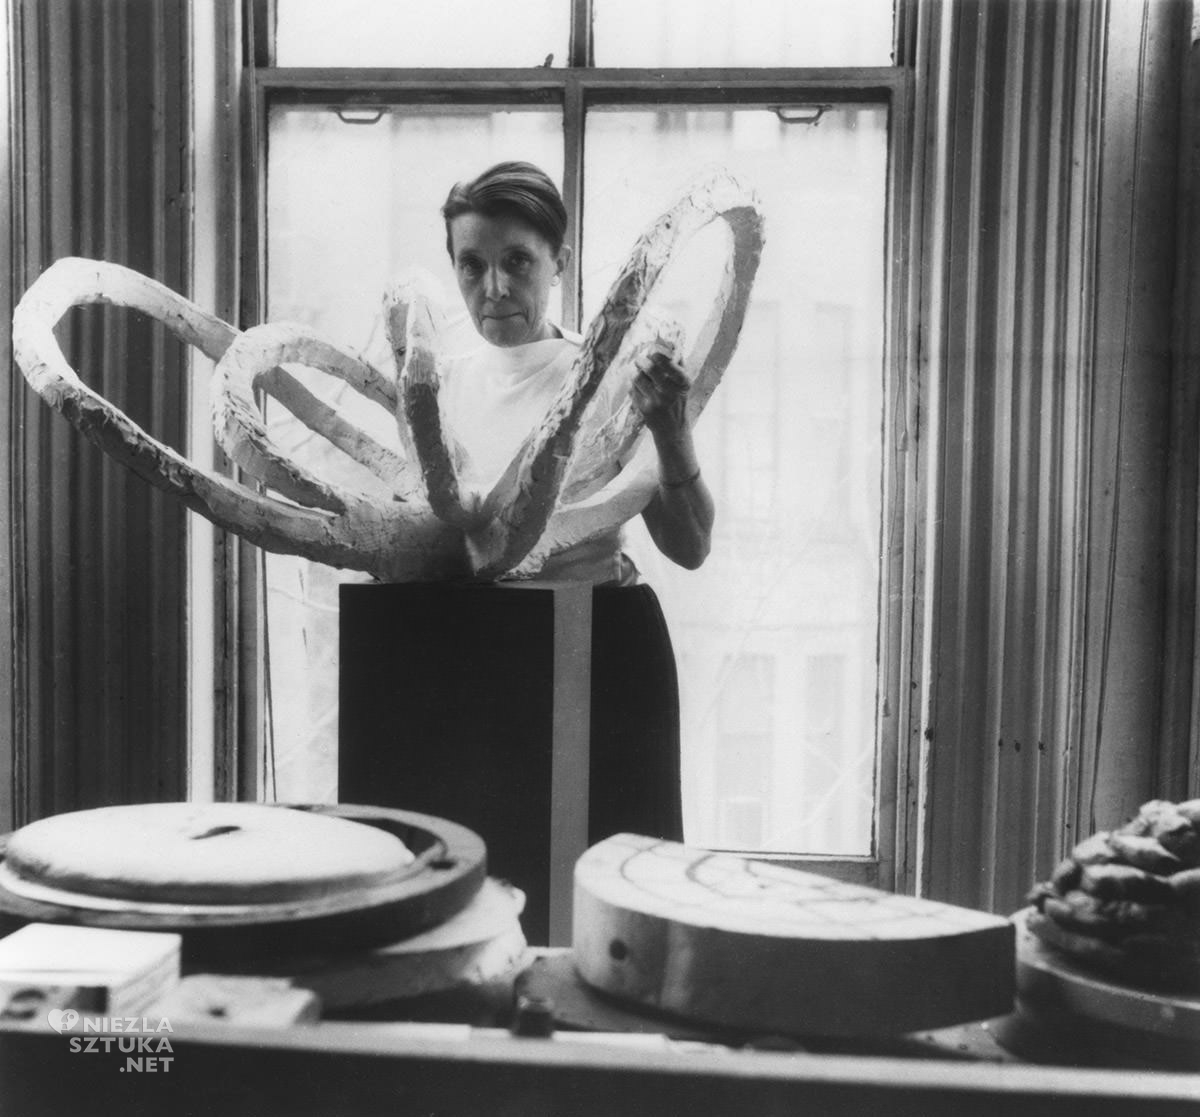 Louise Bourgeois, rzeźbiarka, rzeźba, studio, Life flower, niezła sztuka